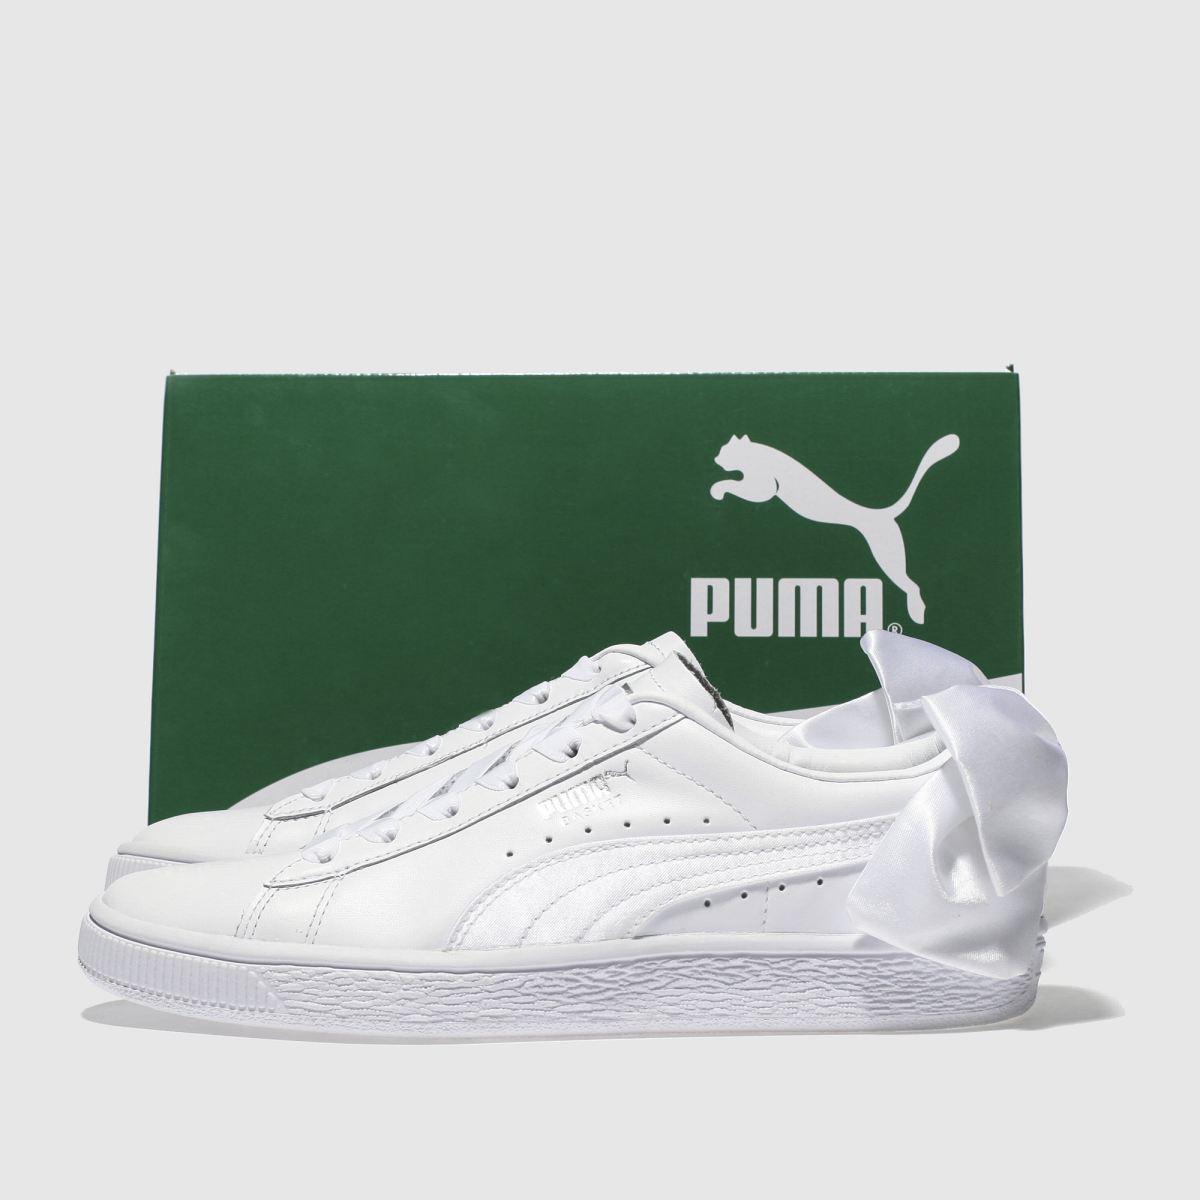 Damen schuh Weiß puma Basket Bow Sneaker   schuh Damen Gute Qualität beliebte Schuhe 24fc3c